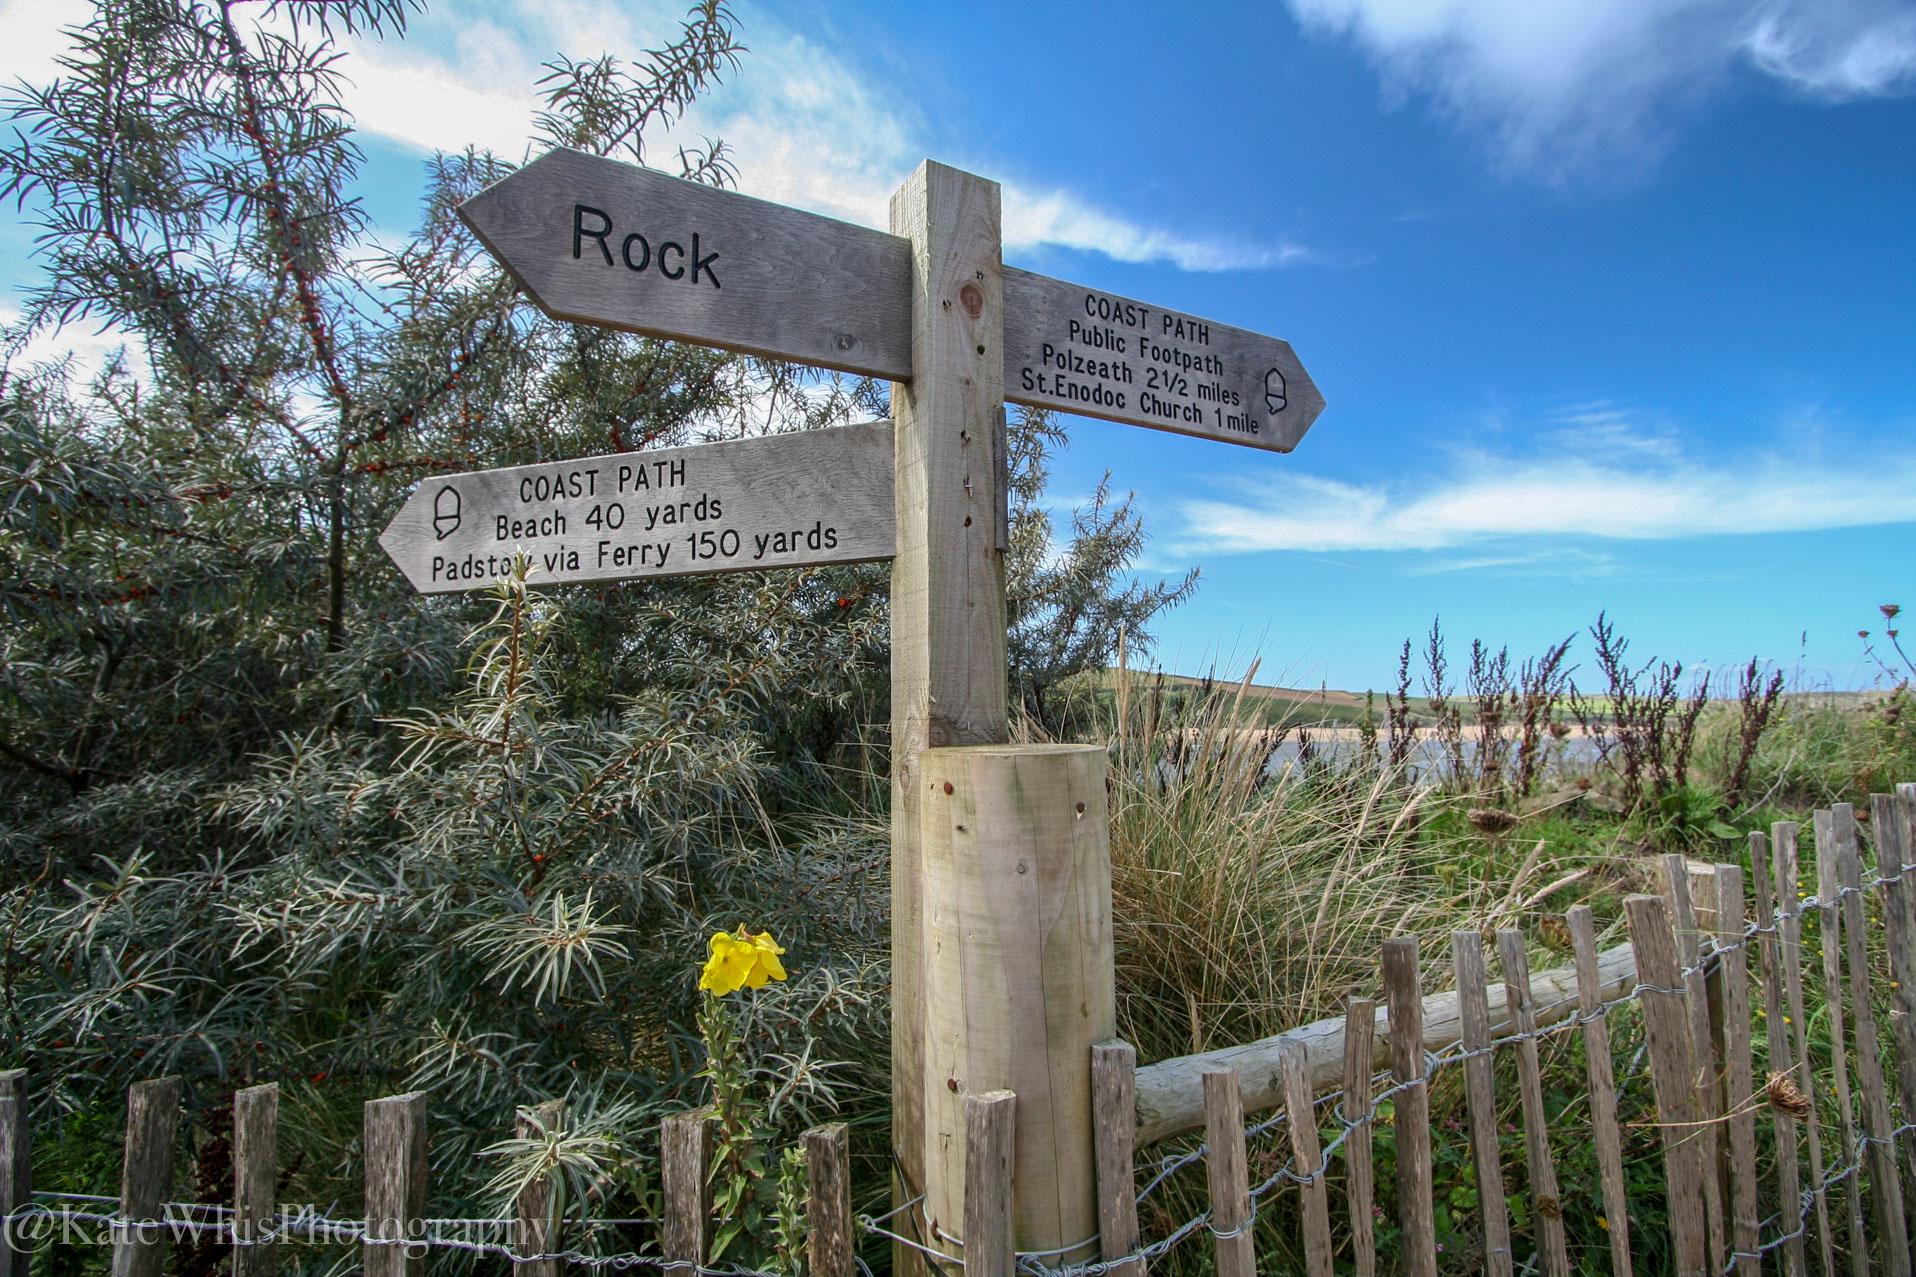 Footpath sign at Rock